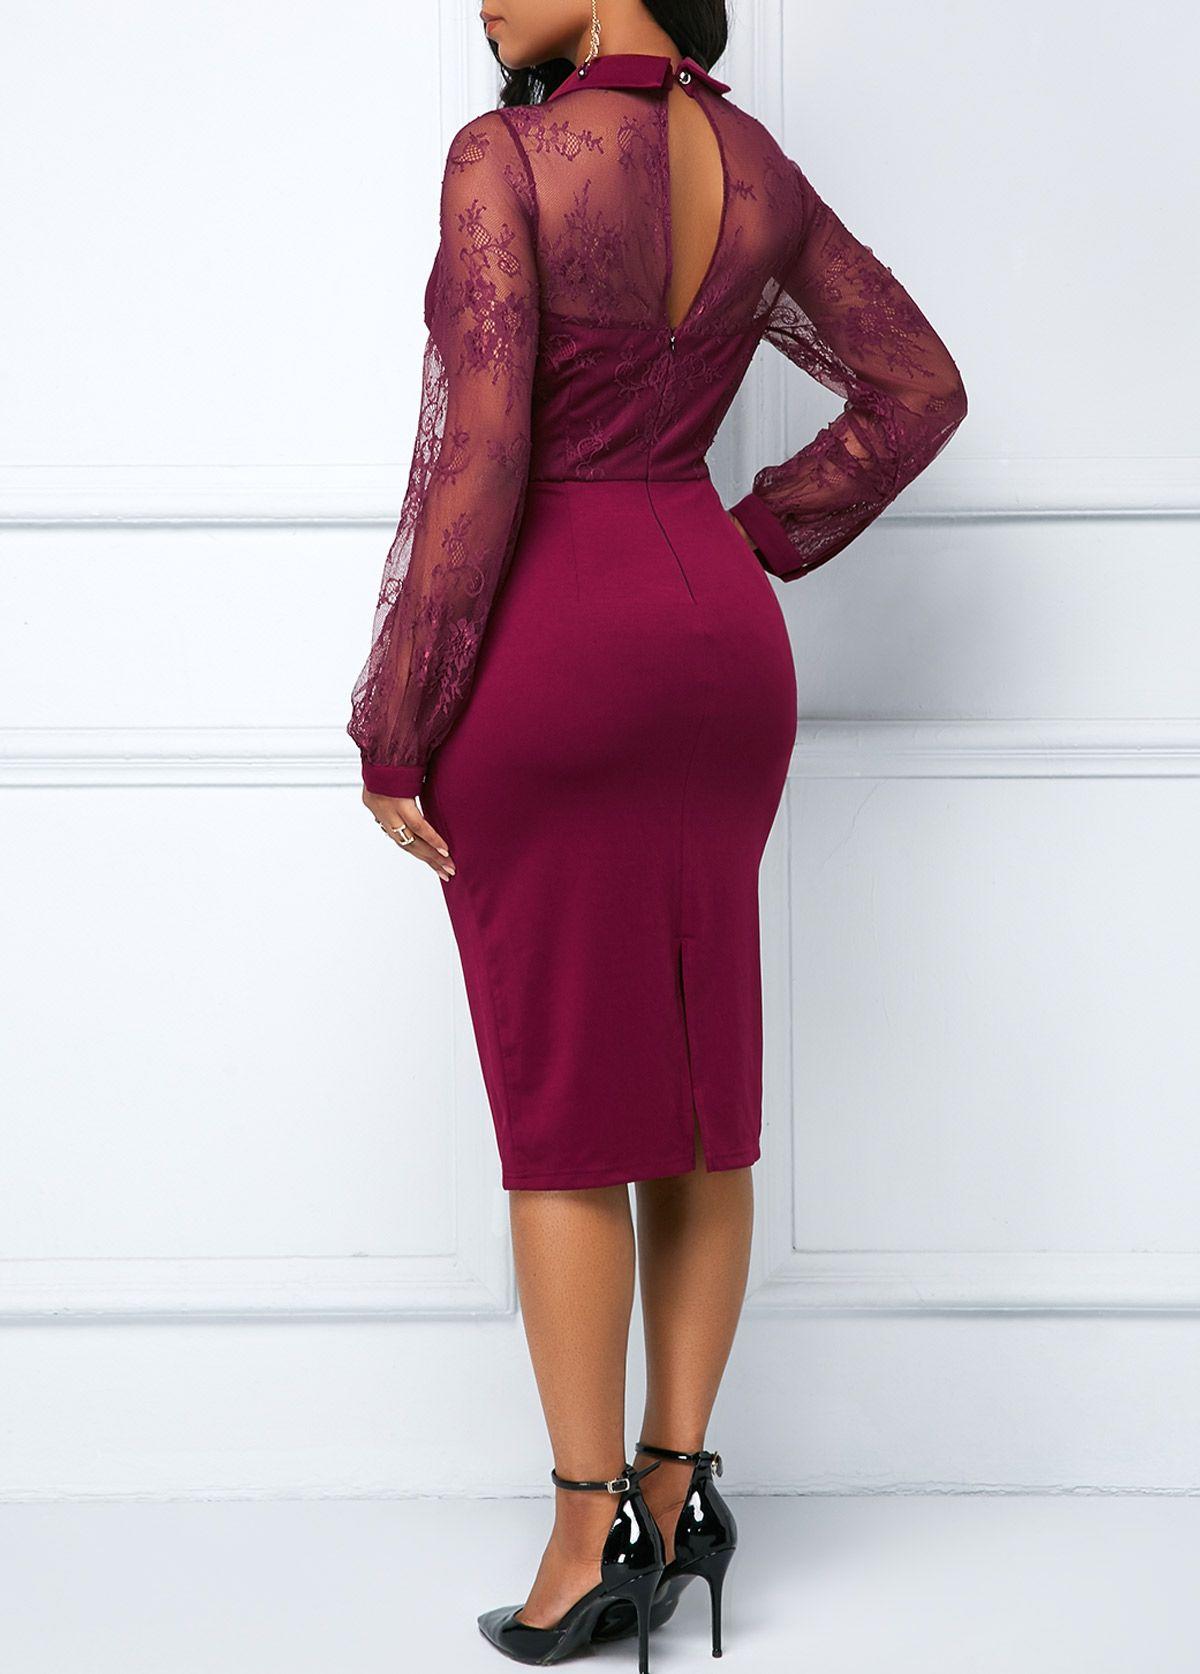 e7b0b9e2c9aad Back Slit Lace Patchwork Sheath Dress